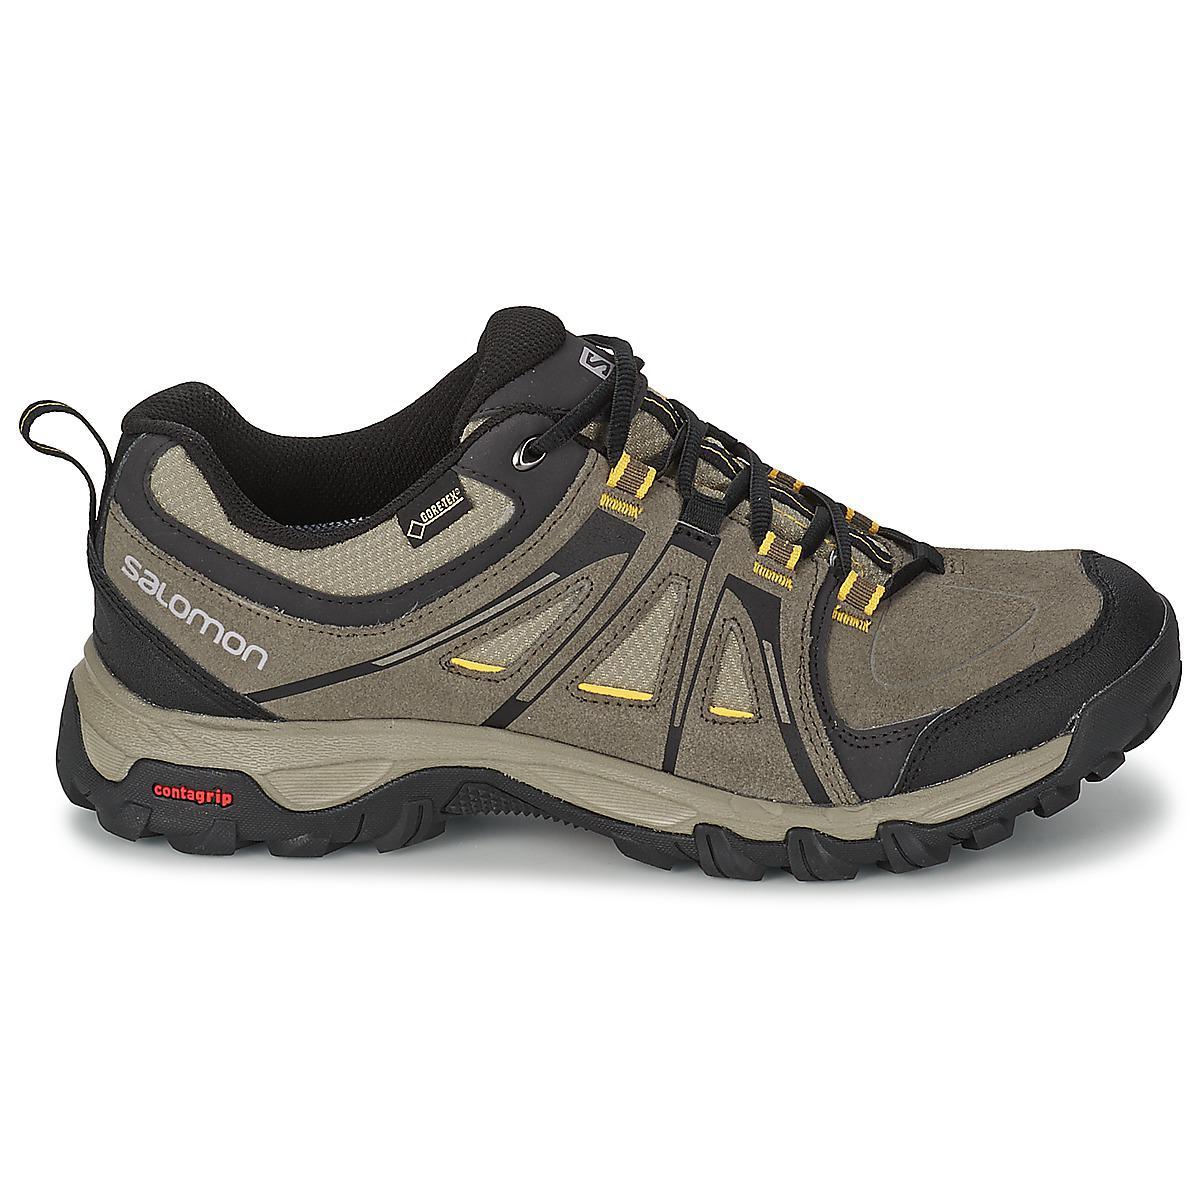 7d360a87c8ad Yves Salomon - Evasion Gtx® Men s Walking Boots In Brown for Men - Lyst.  View fullscreen